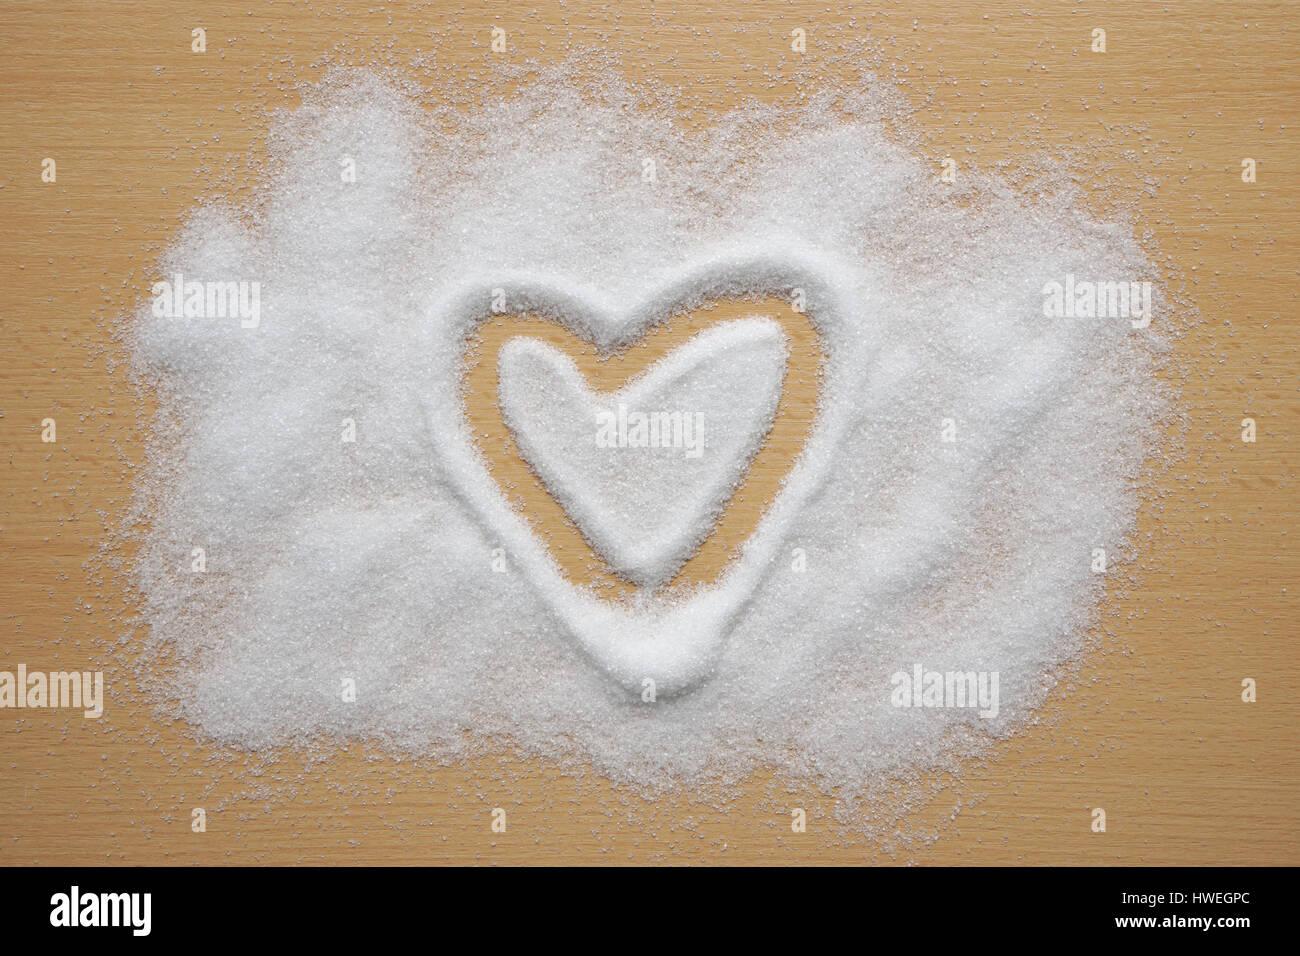 heart shape drawn in sugar - Stock Image